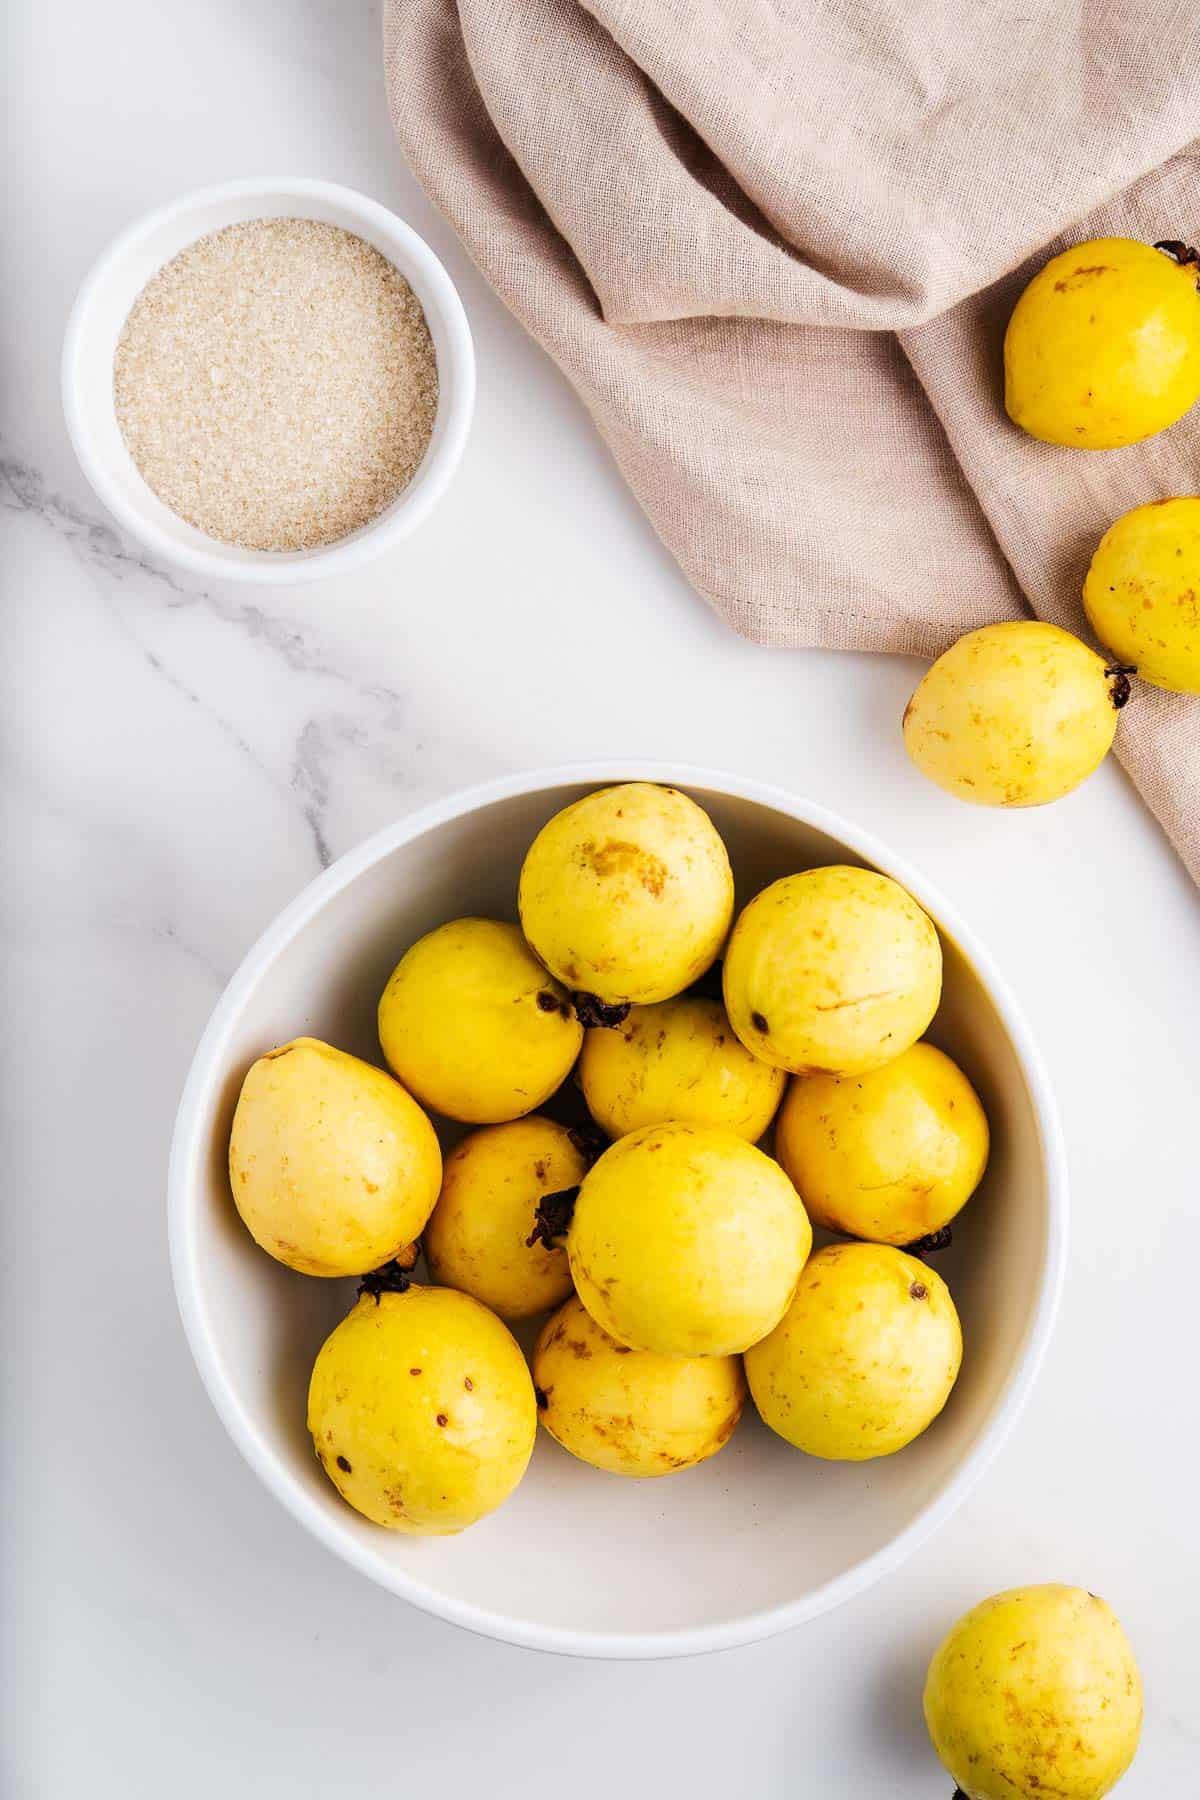 Guavas and Cane Sugar in Bowls